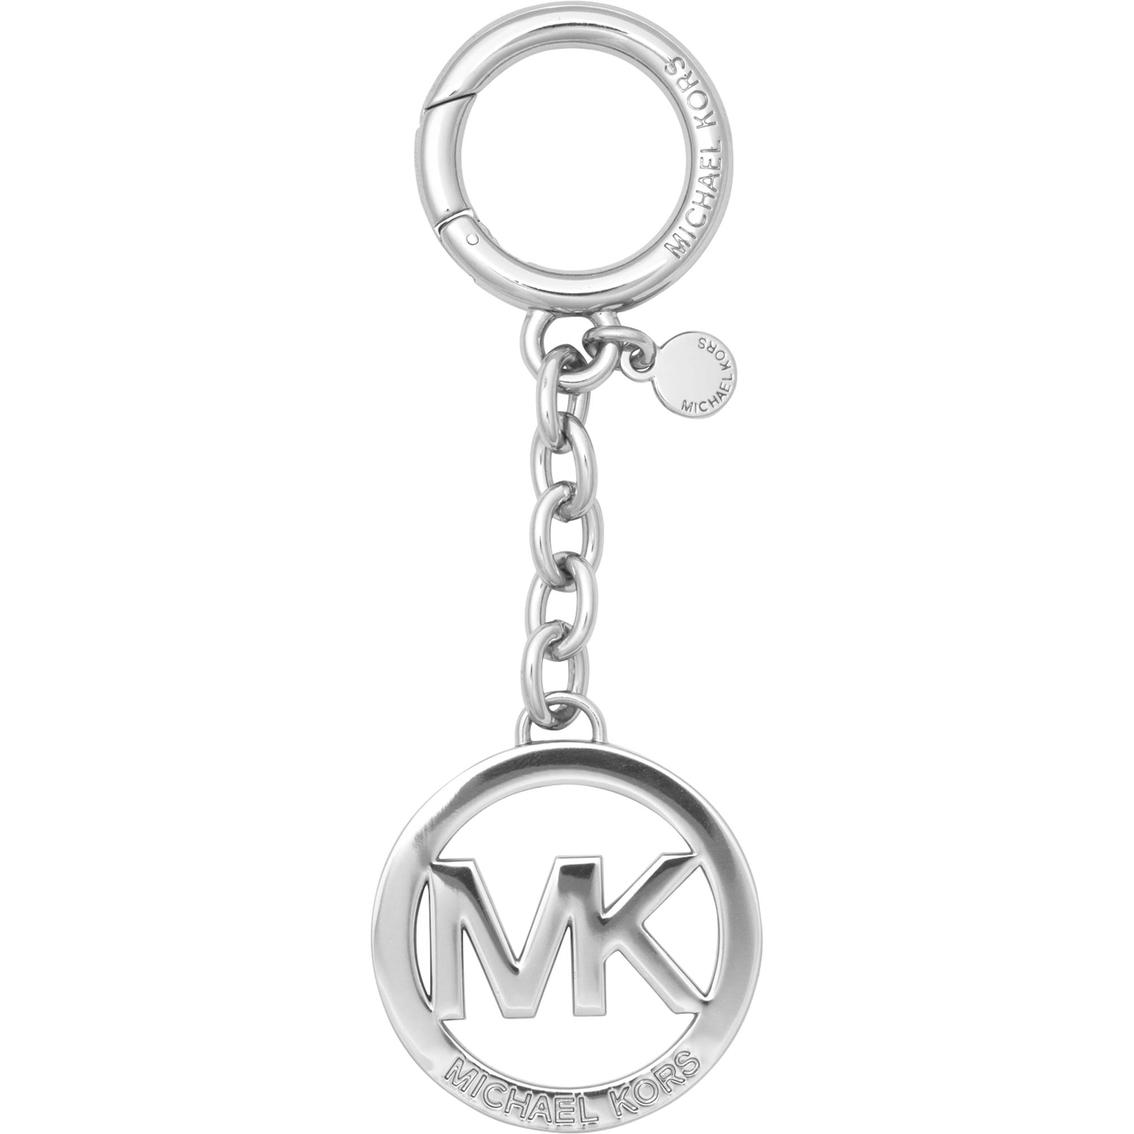 699ff4a40831 Michael Kors Charms Metal Mk Key Fob